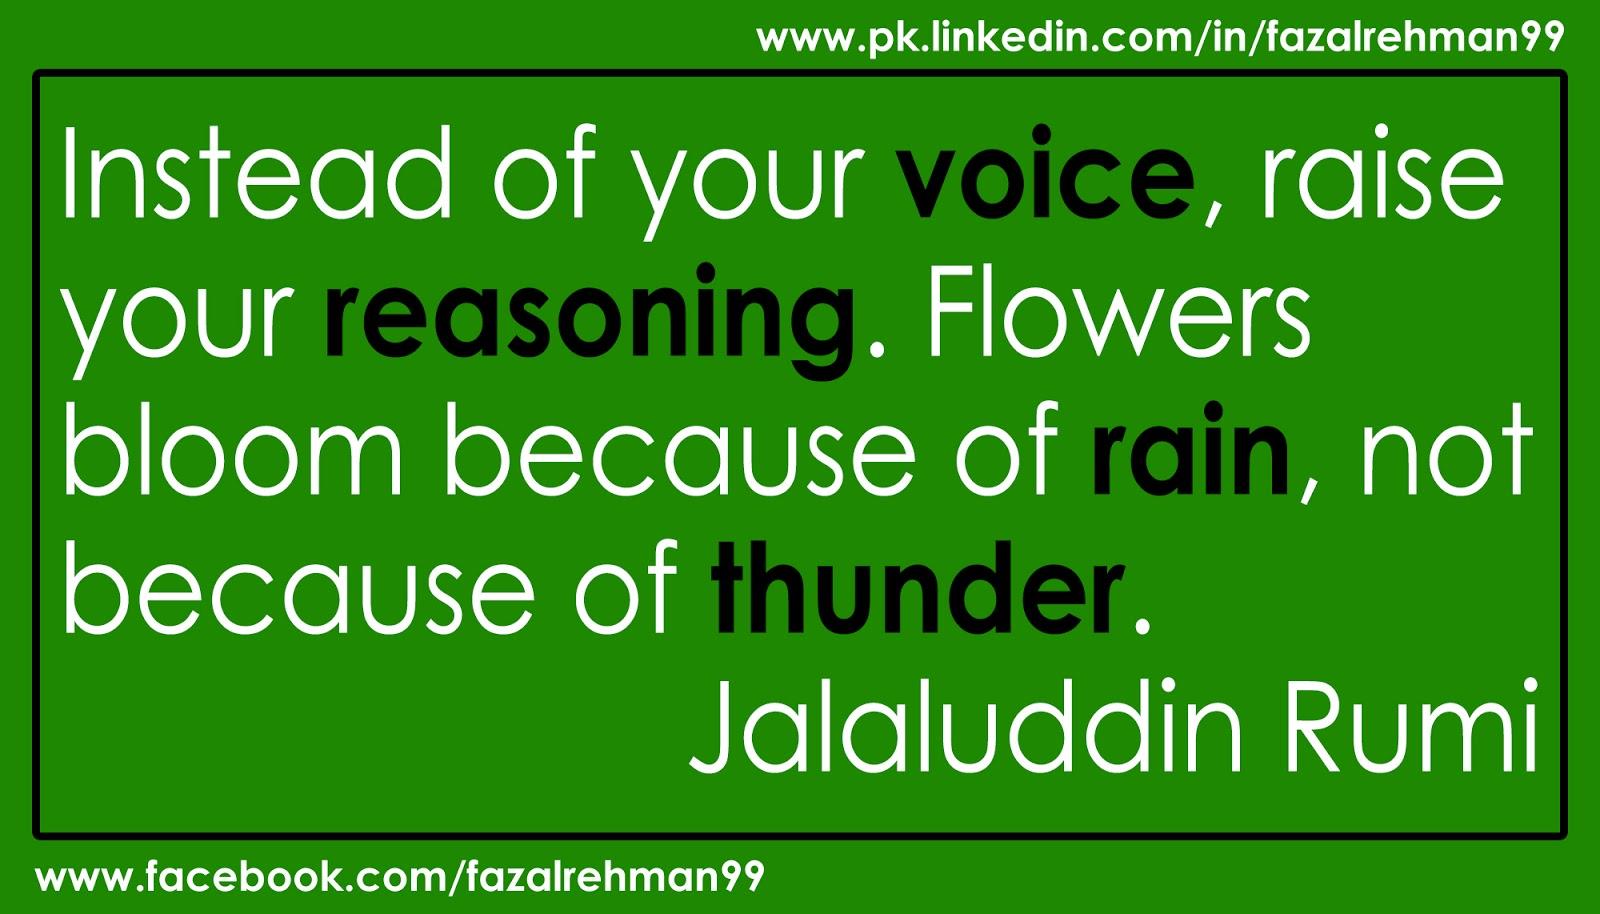 Fazal Rehman Jalaluddin Rumi Raise Your Reasoning Quotes